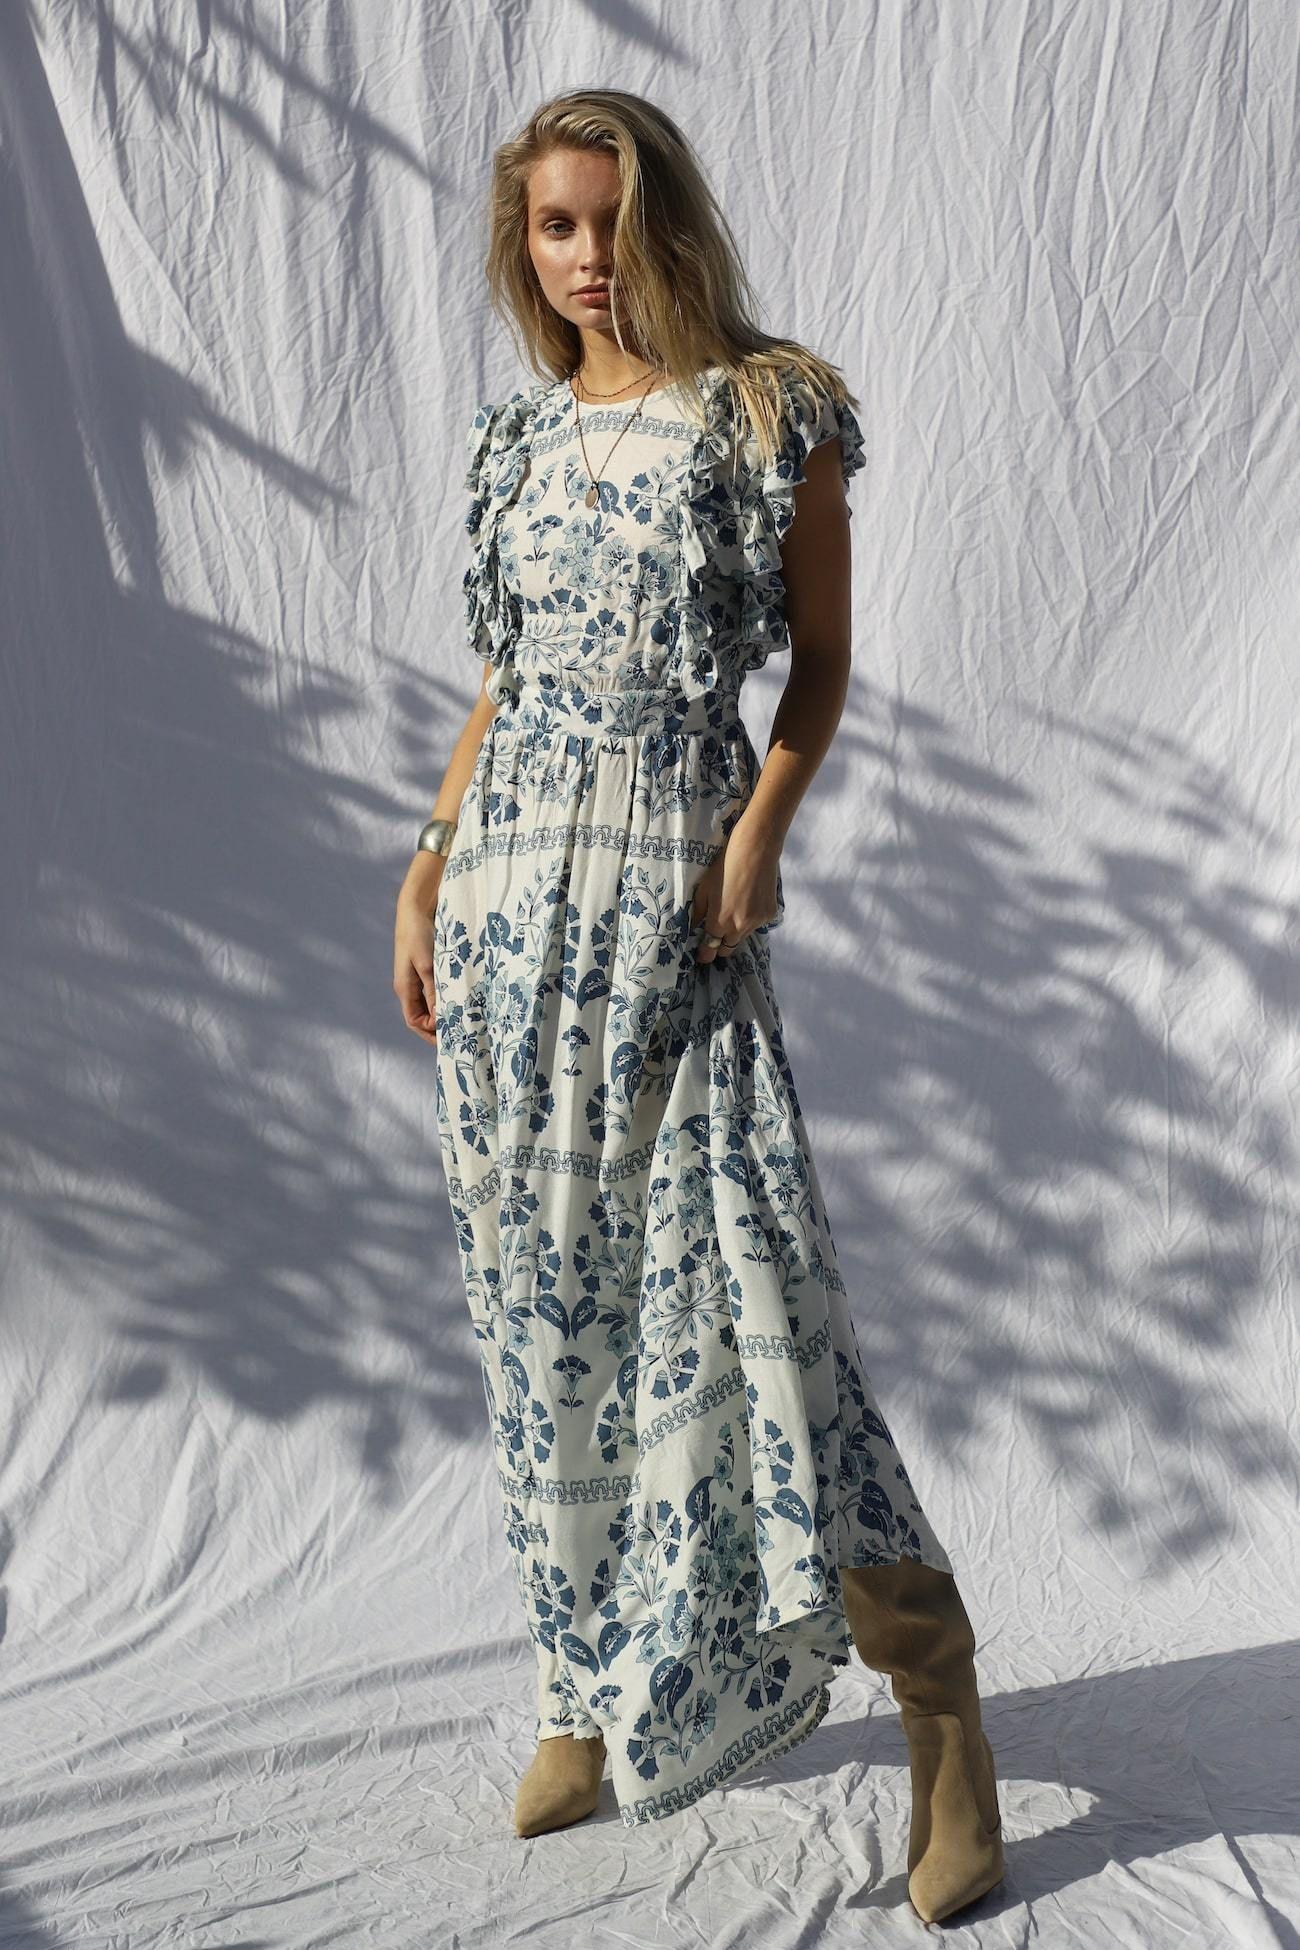 Flower Court Maxi Dress In 2021 Maxi Dress Viscose Maxi Dress Maxi Dress With Sleeves [ 1950 x 1300 Pixel ]